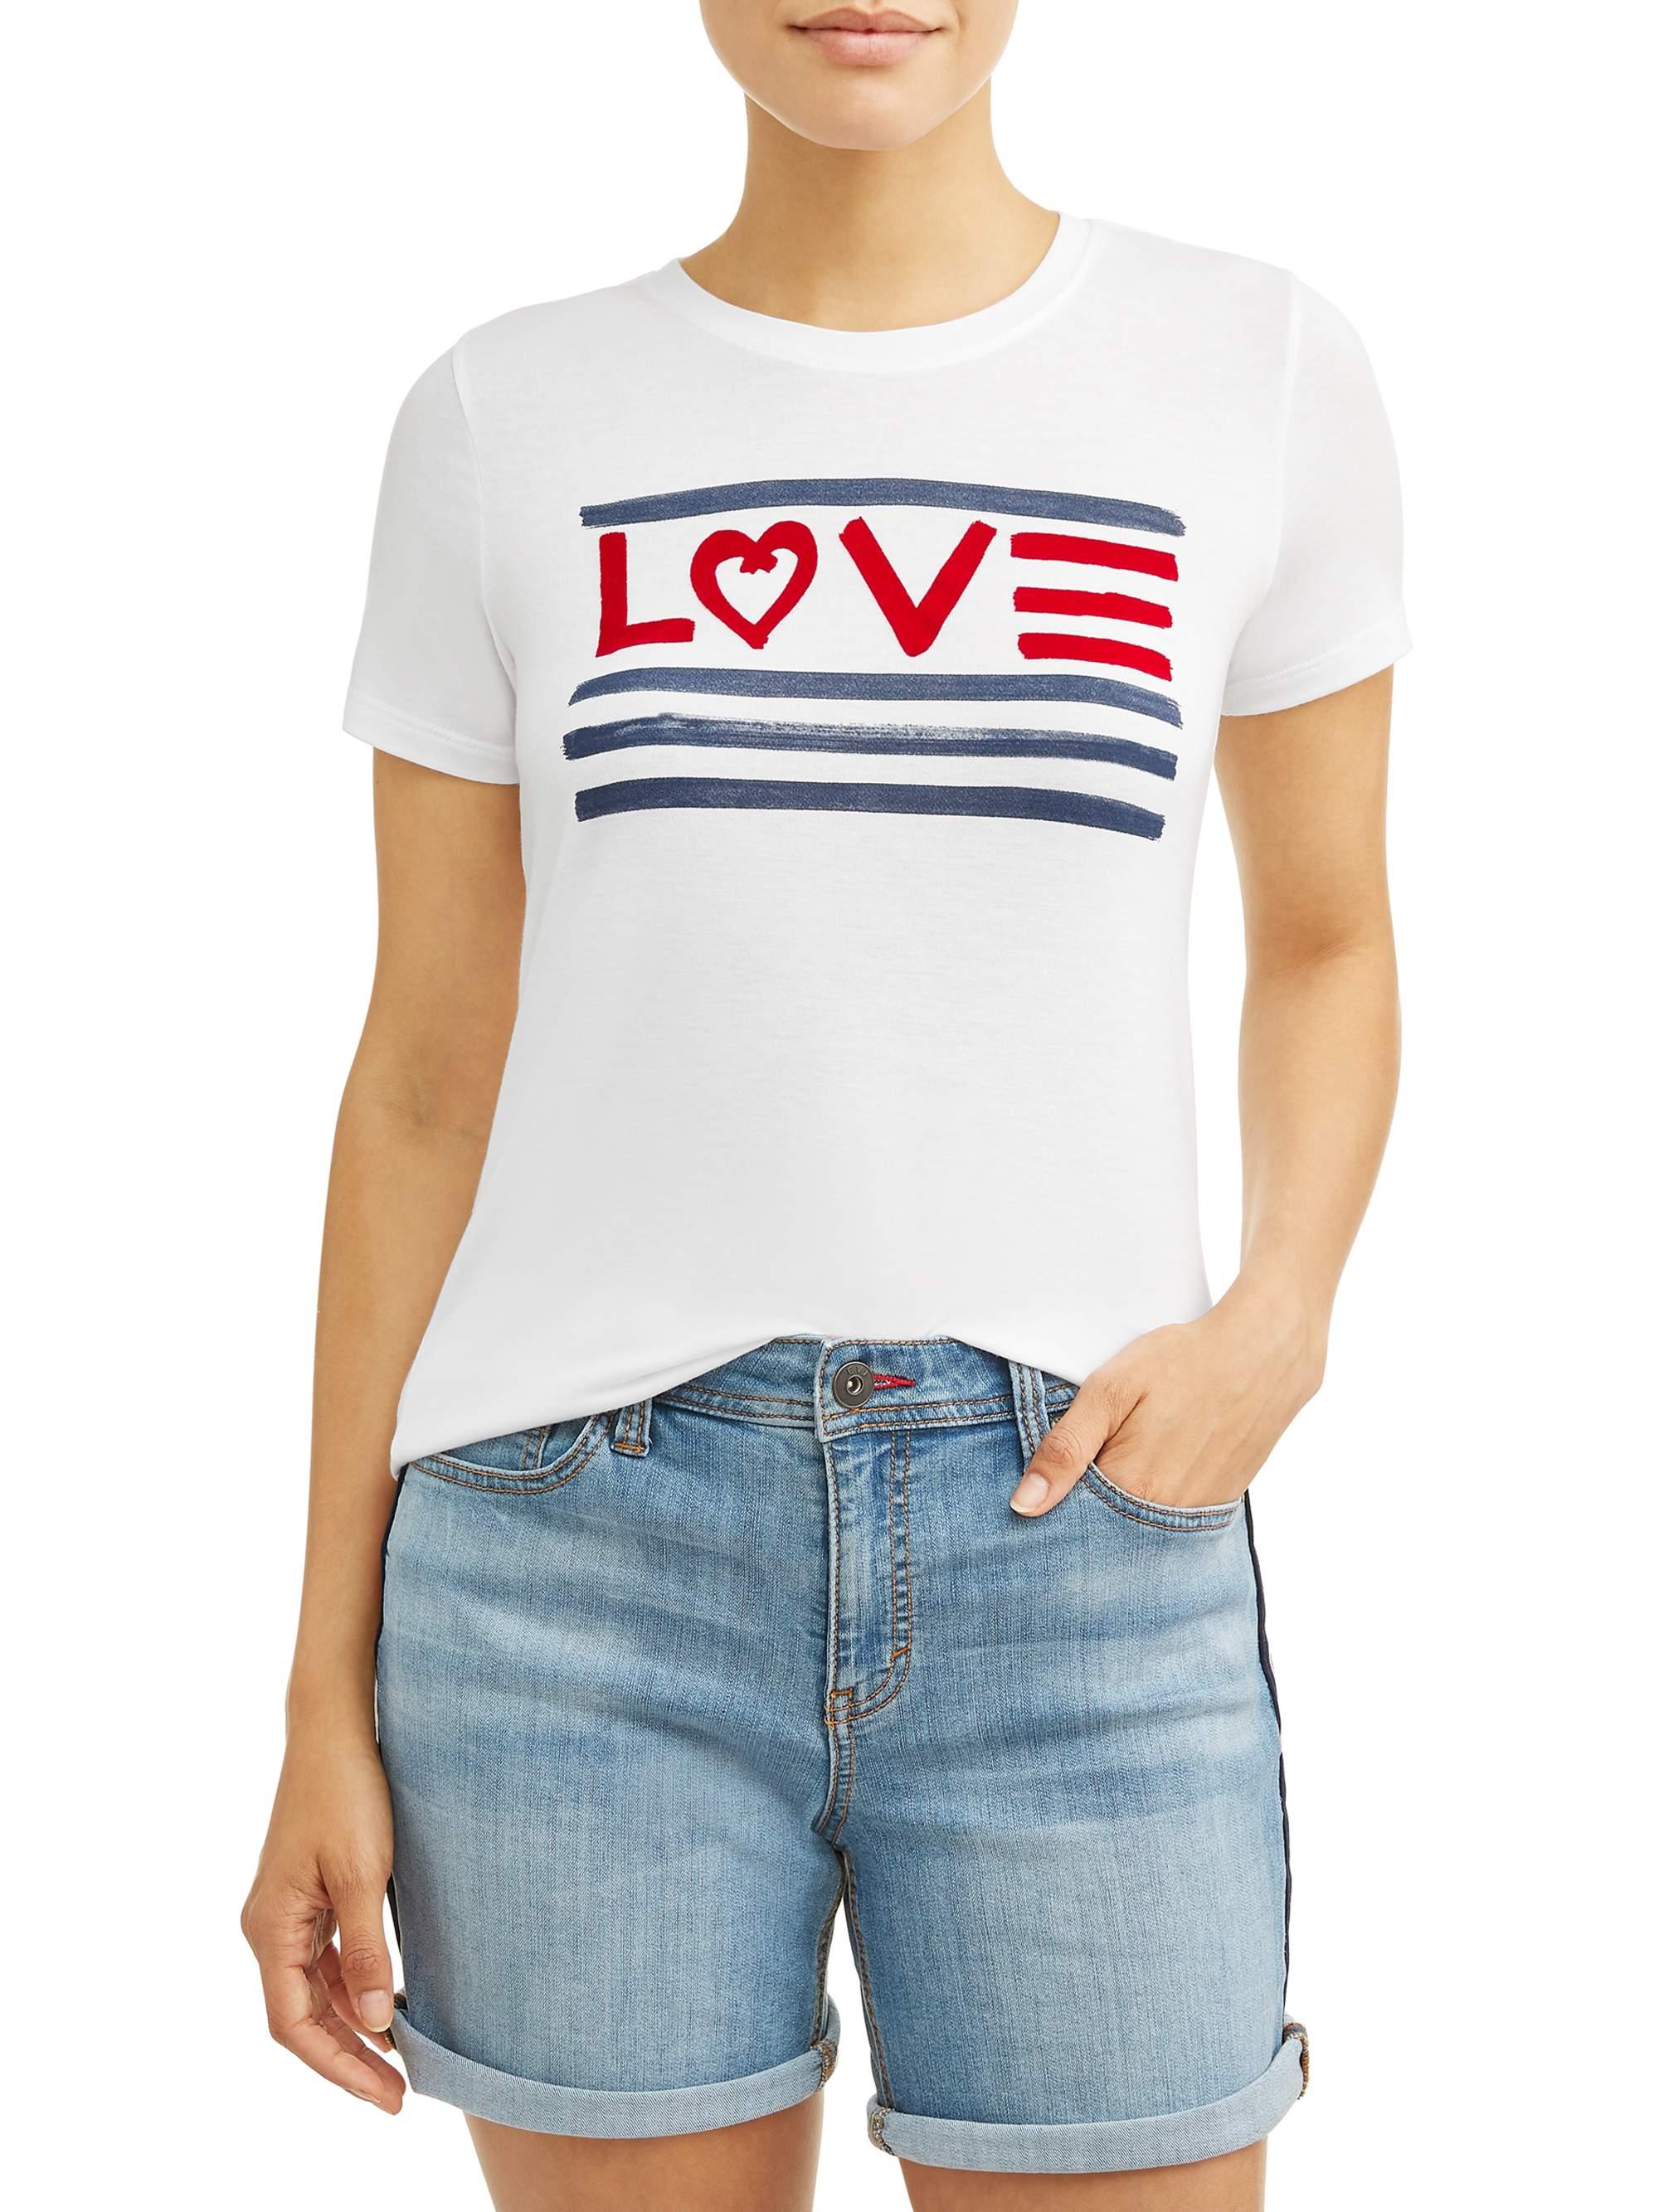 Love Flag Crew Neck Tee Women's (White)